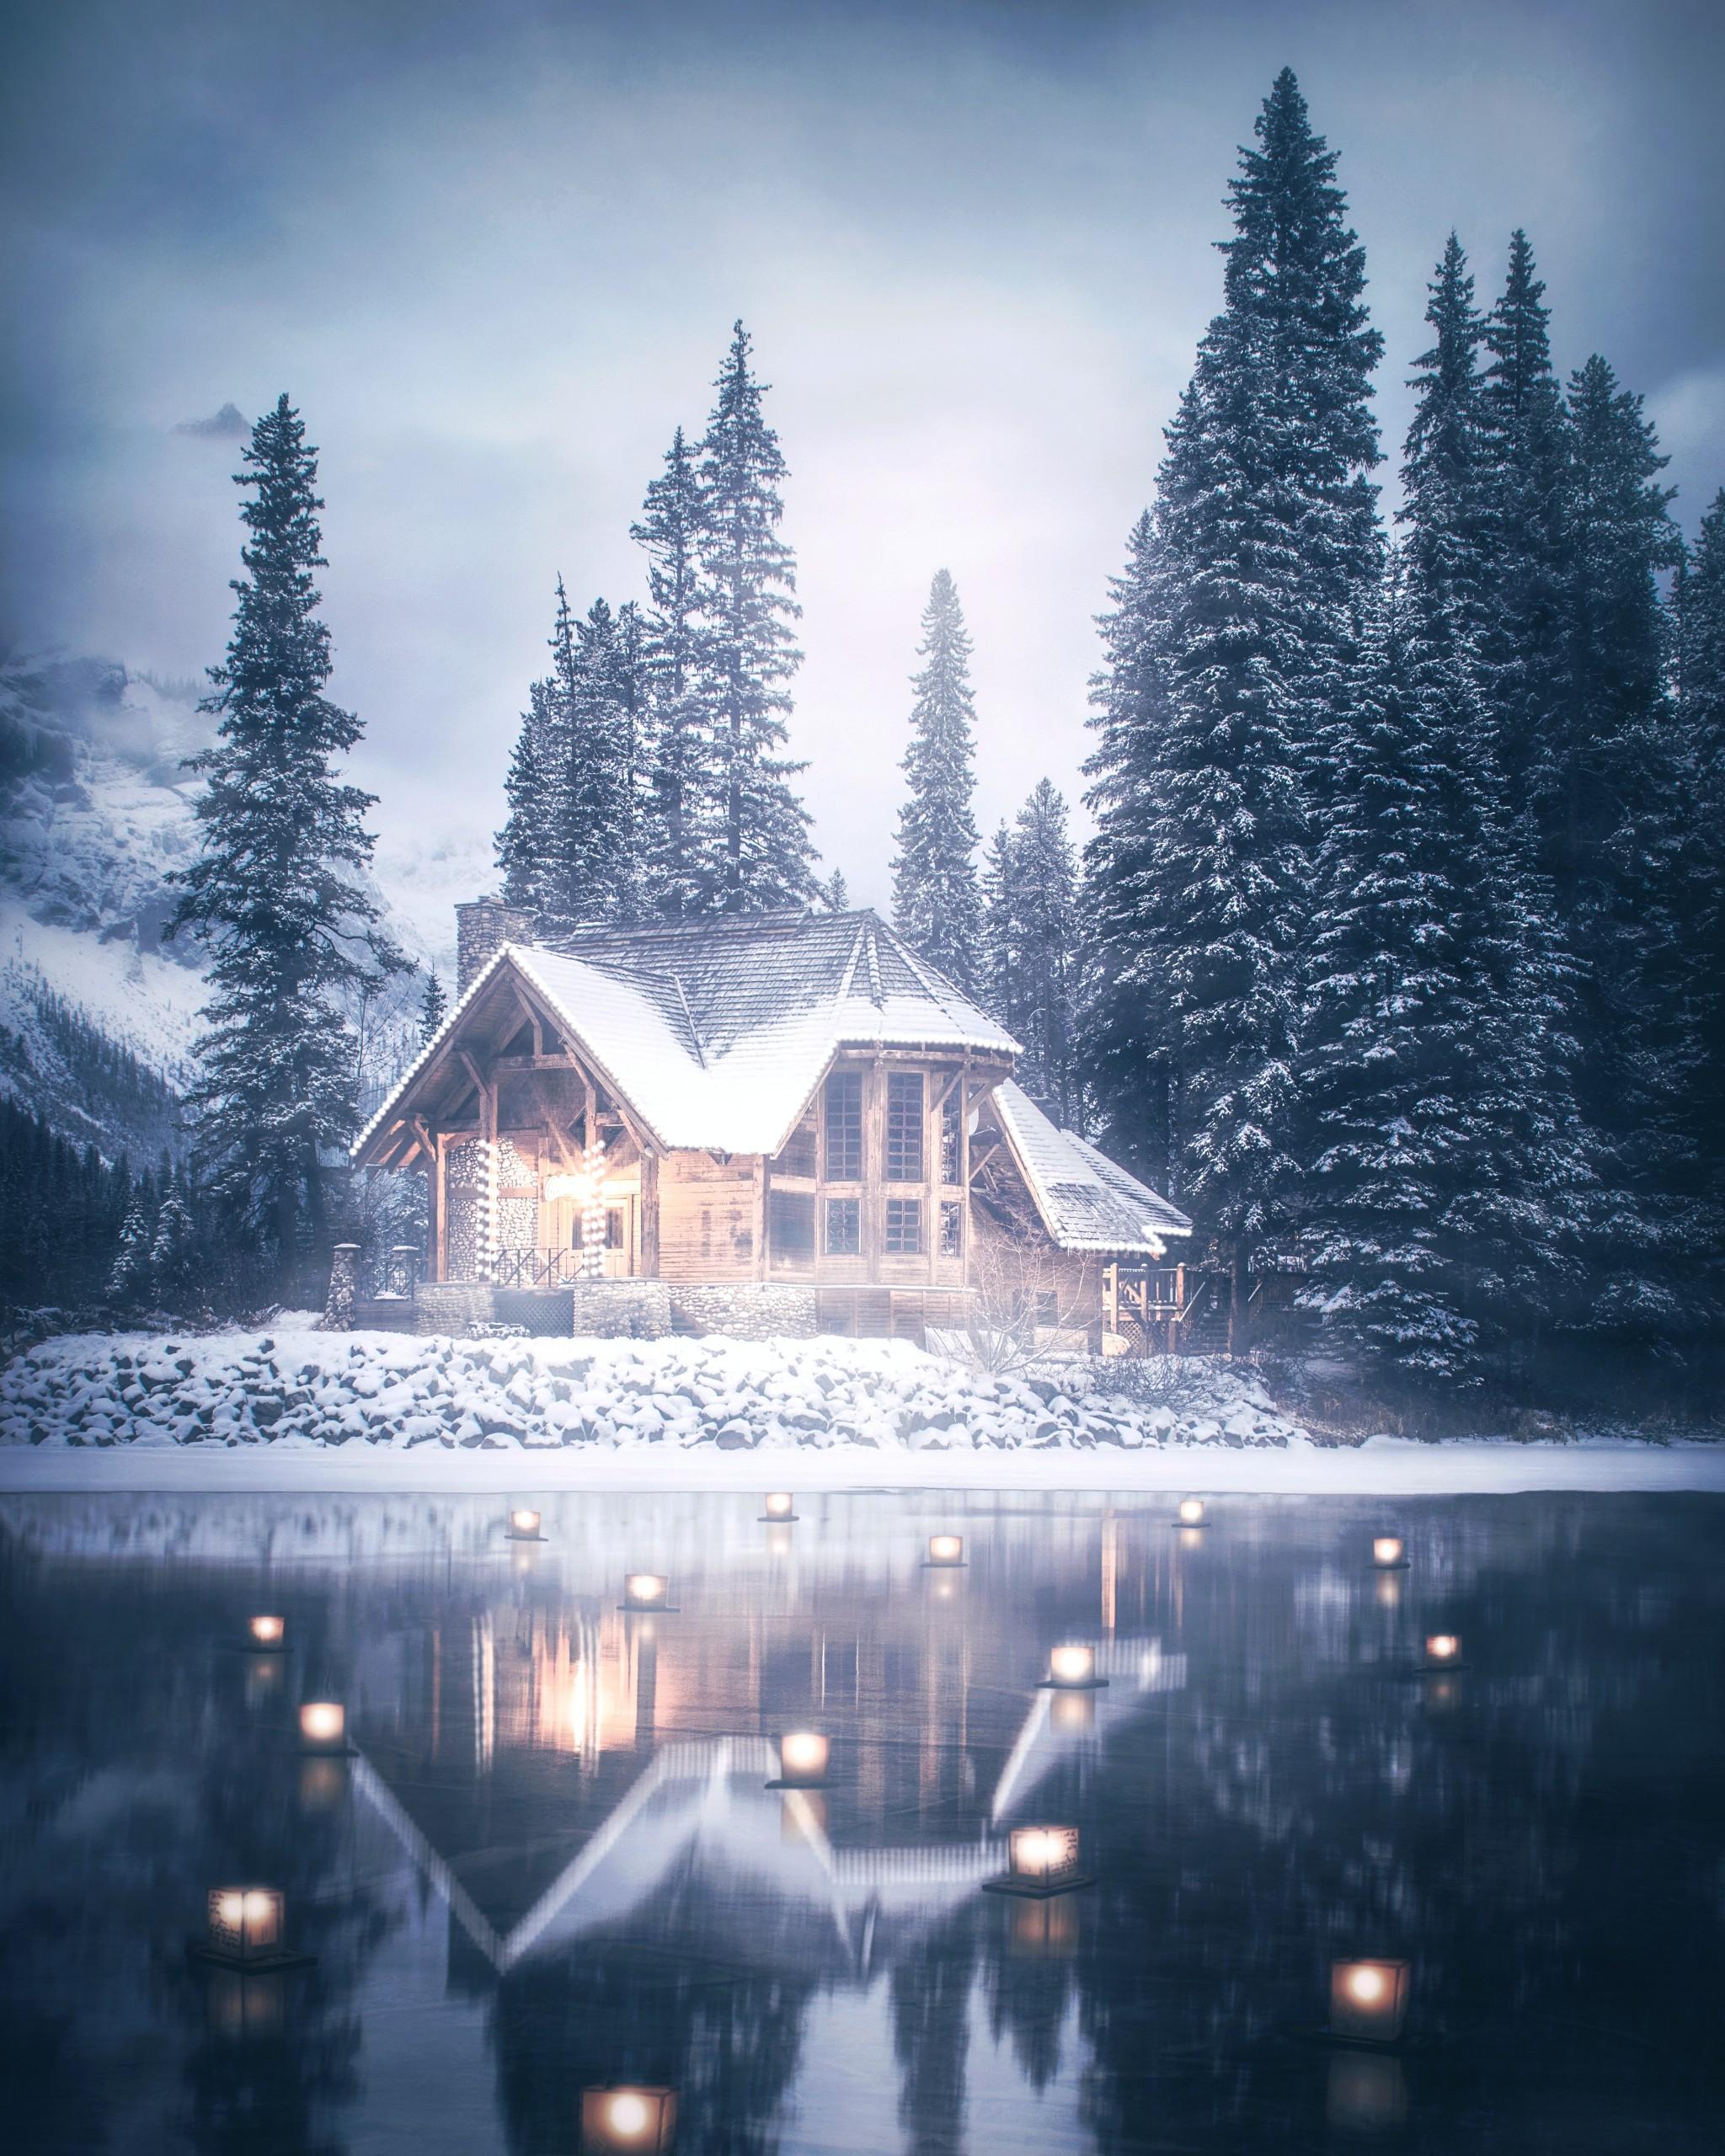 Instagram Canada Emeraldlake Image By Jakub Segen